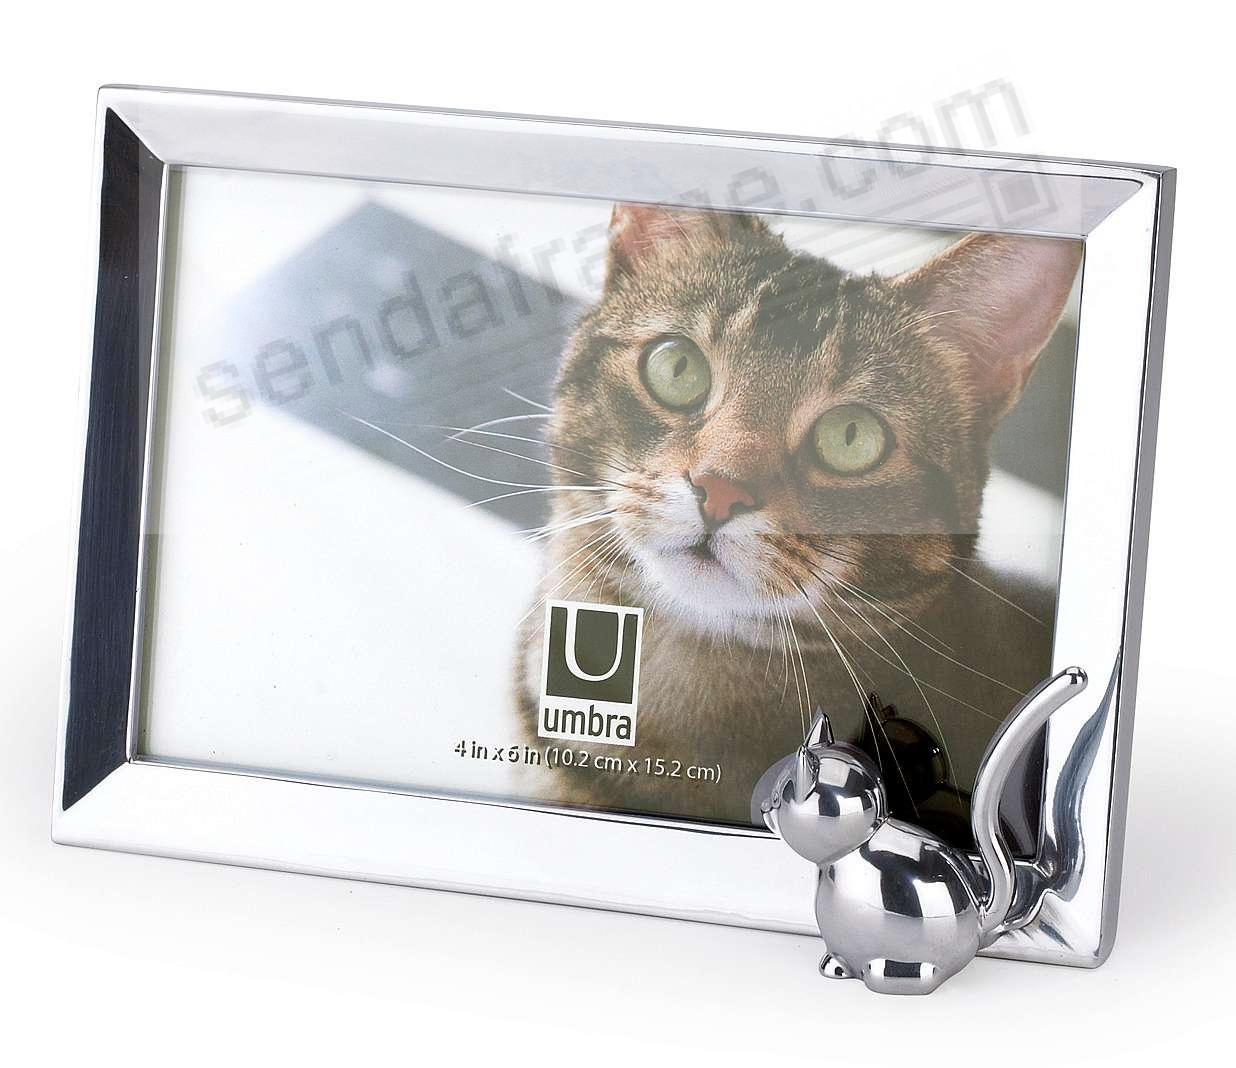 Umbra MEMOIRE CAT frame for 6x4 prints - Picture Frames, Photo ...